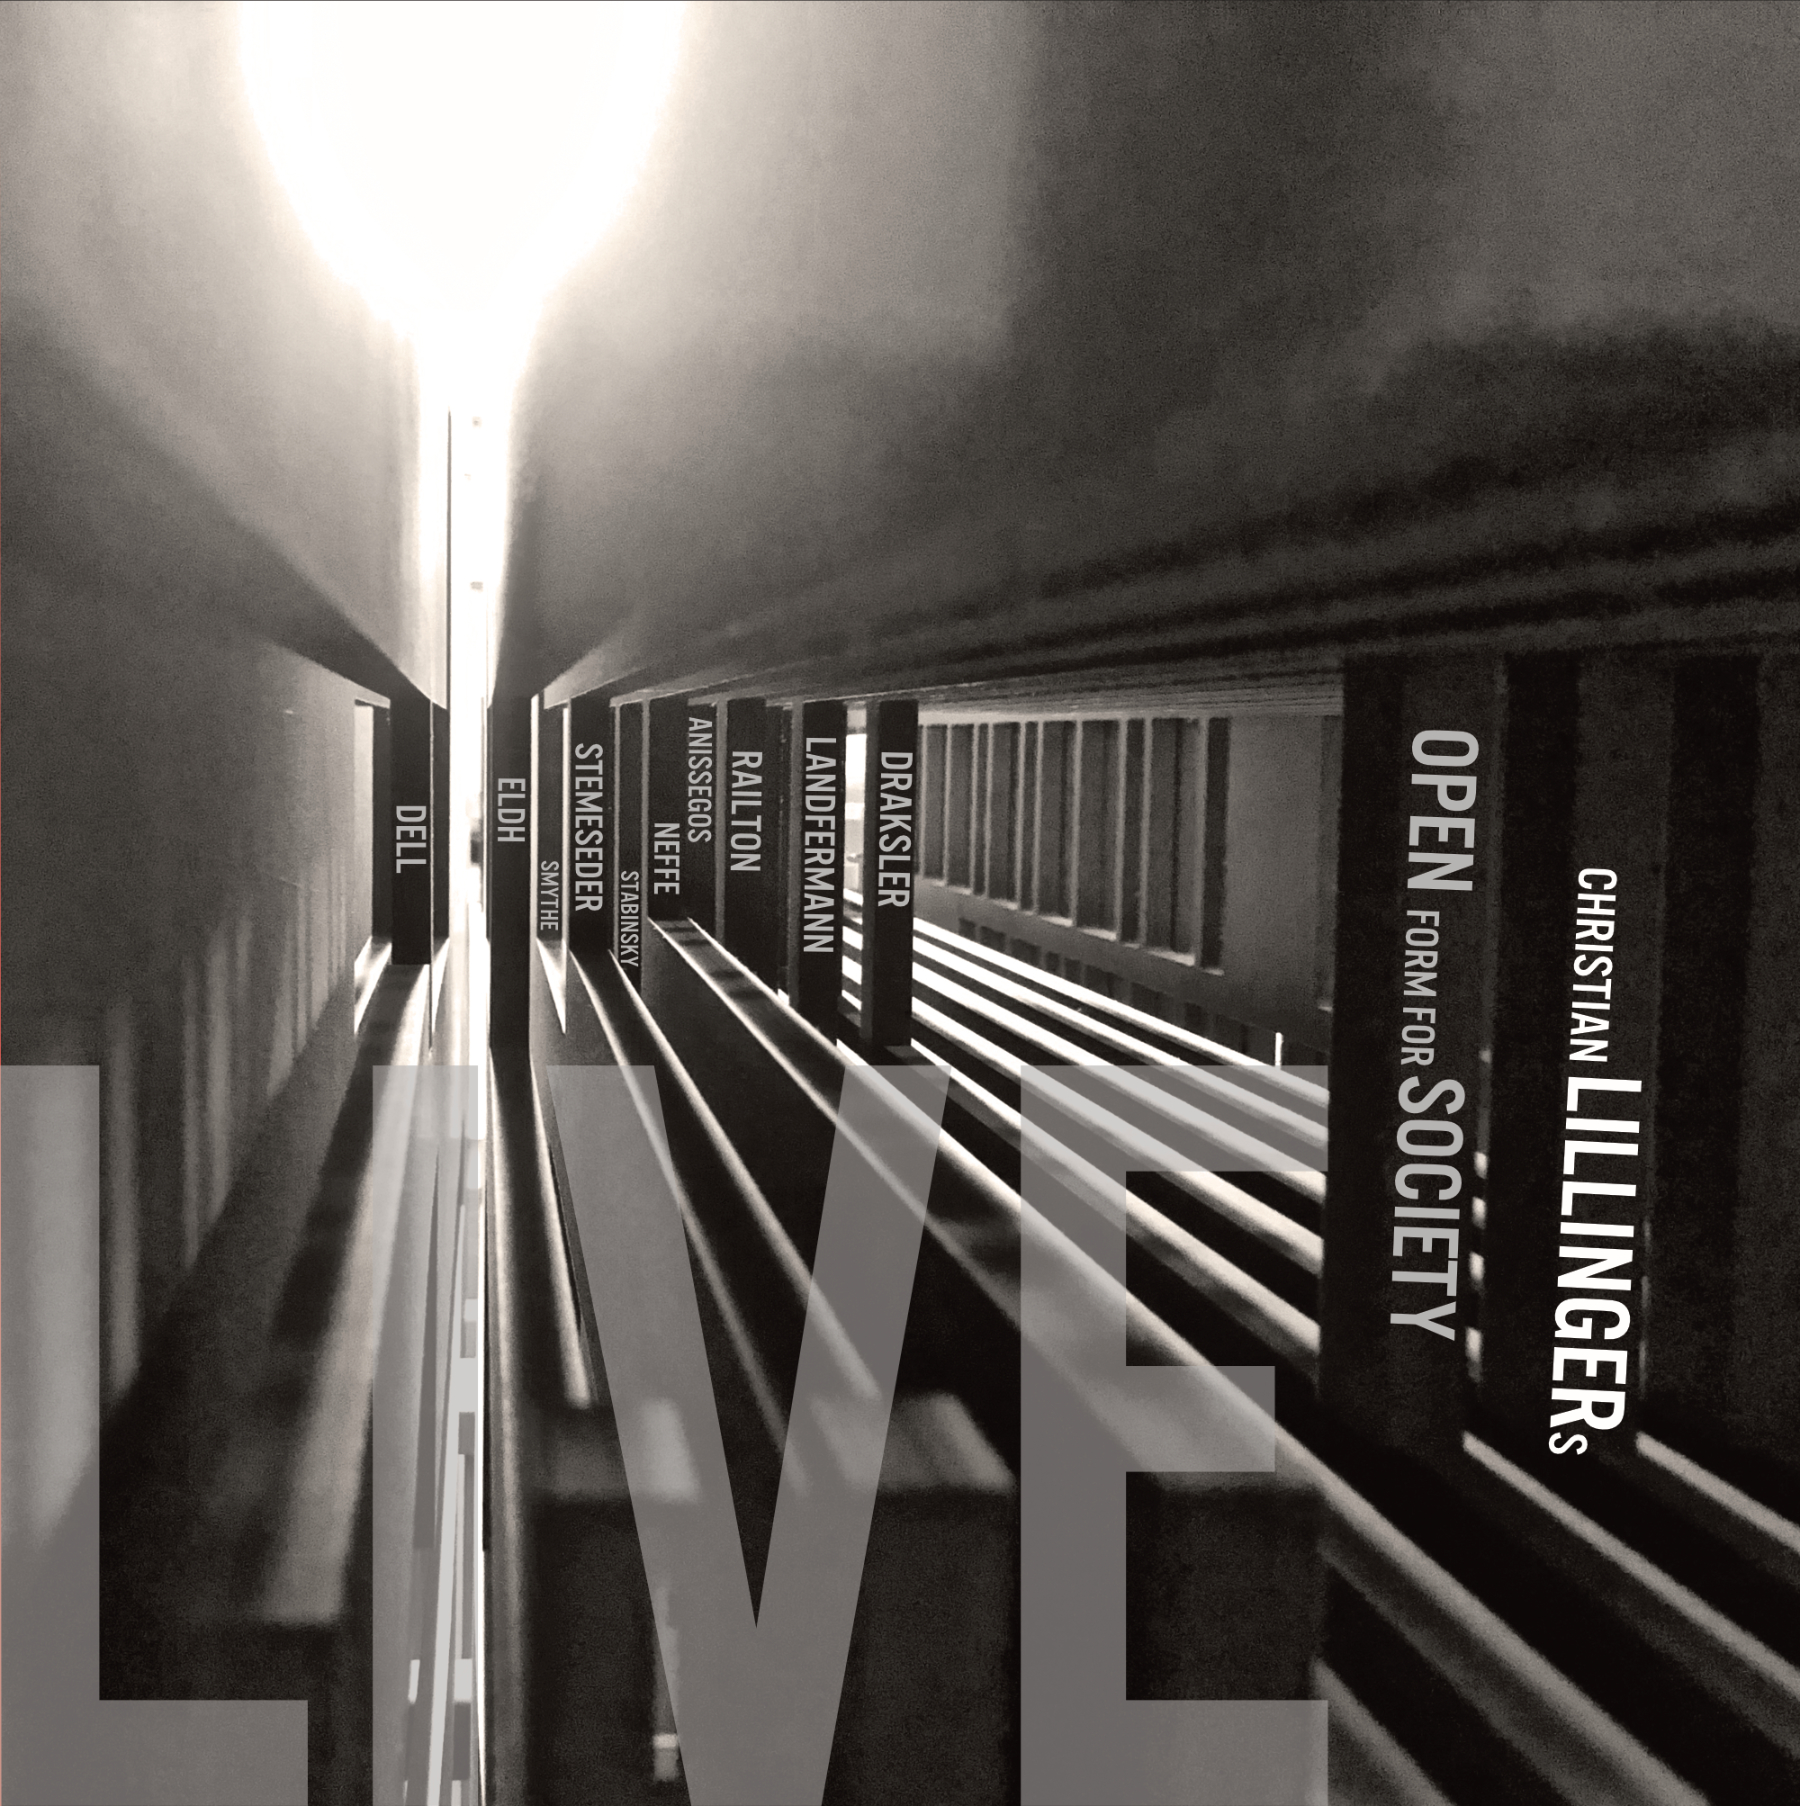 CHRISTIAN LILLINGER - Open Form For Society Live cover